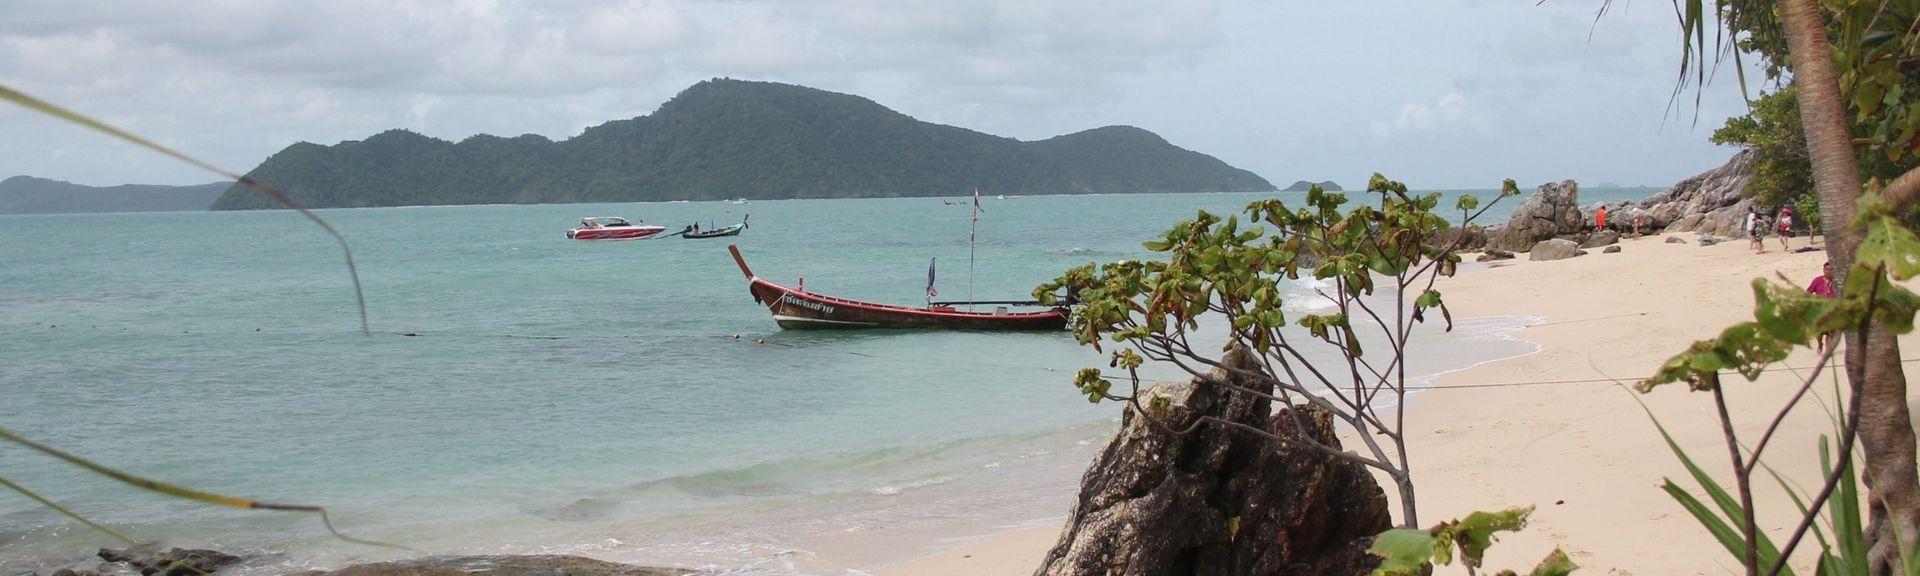 Chalong, Province de Phuket, Thaïlande